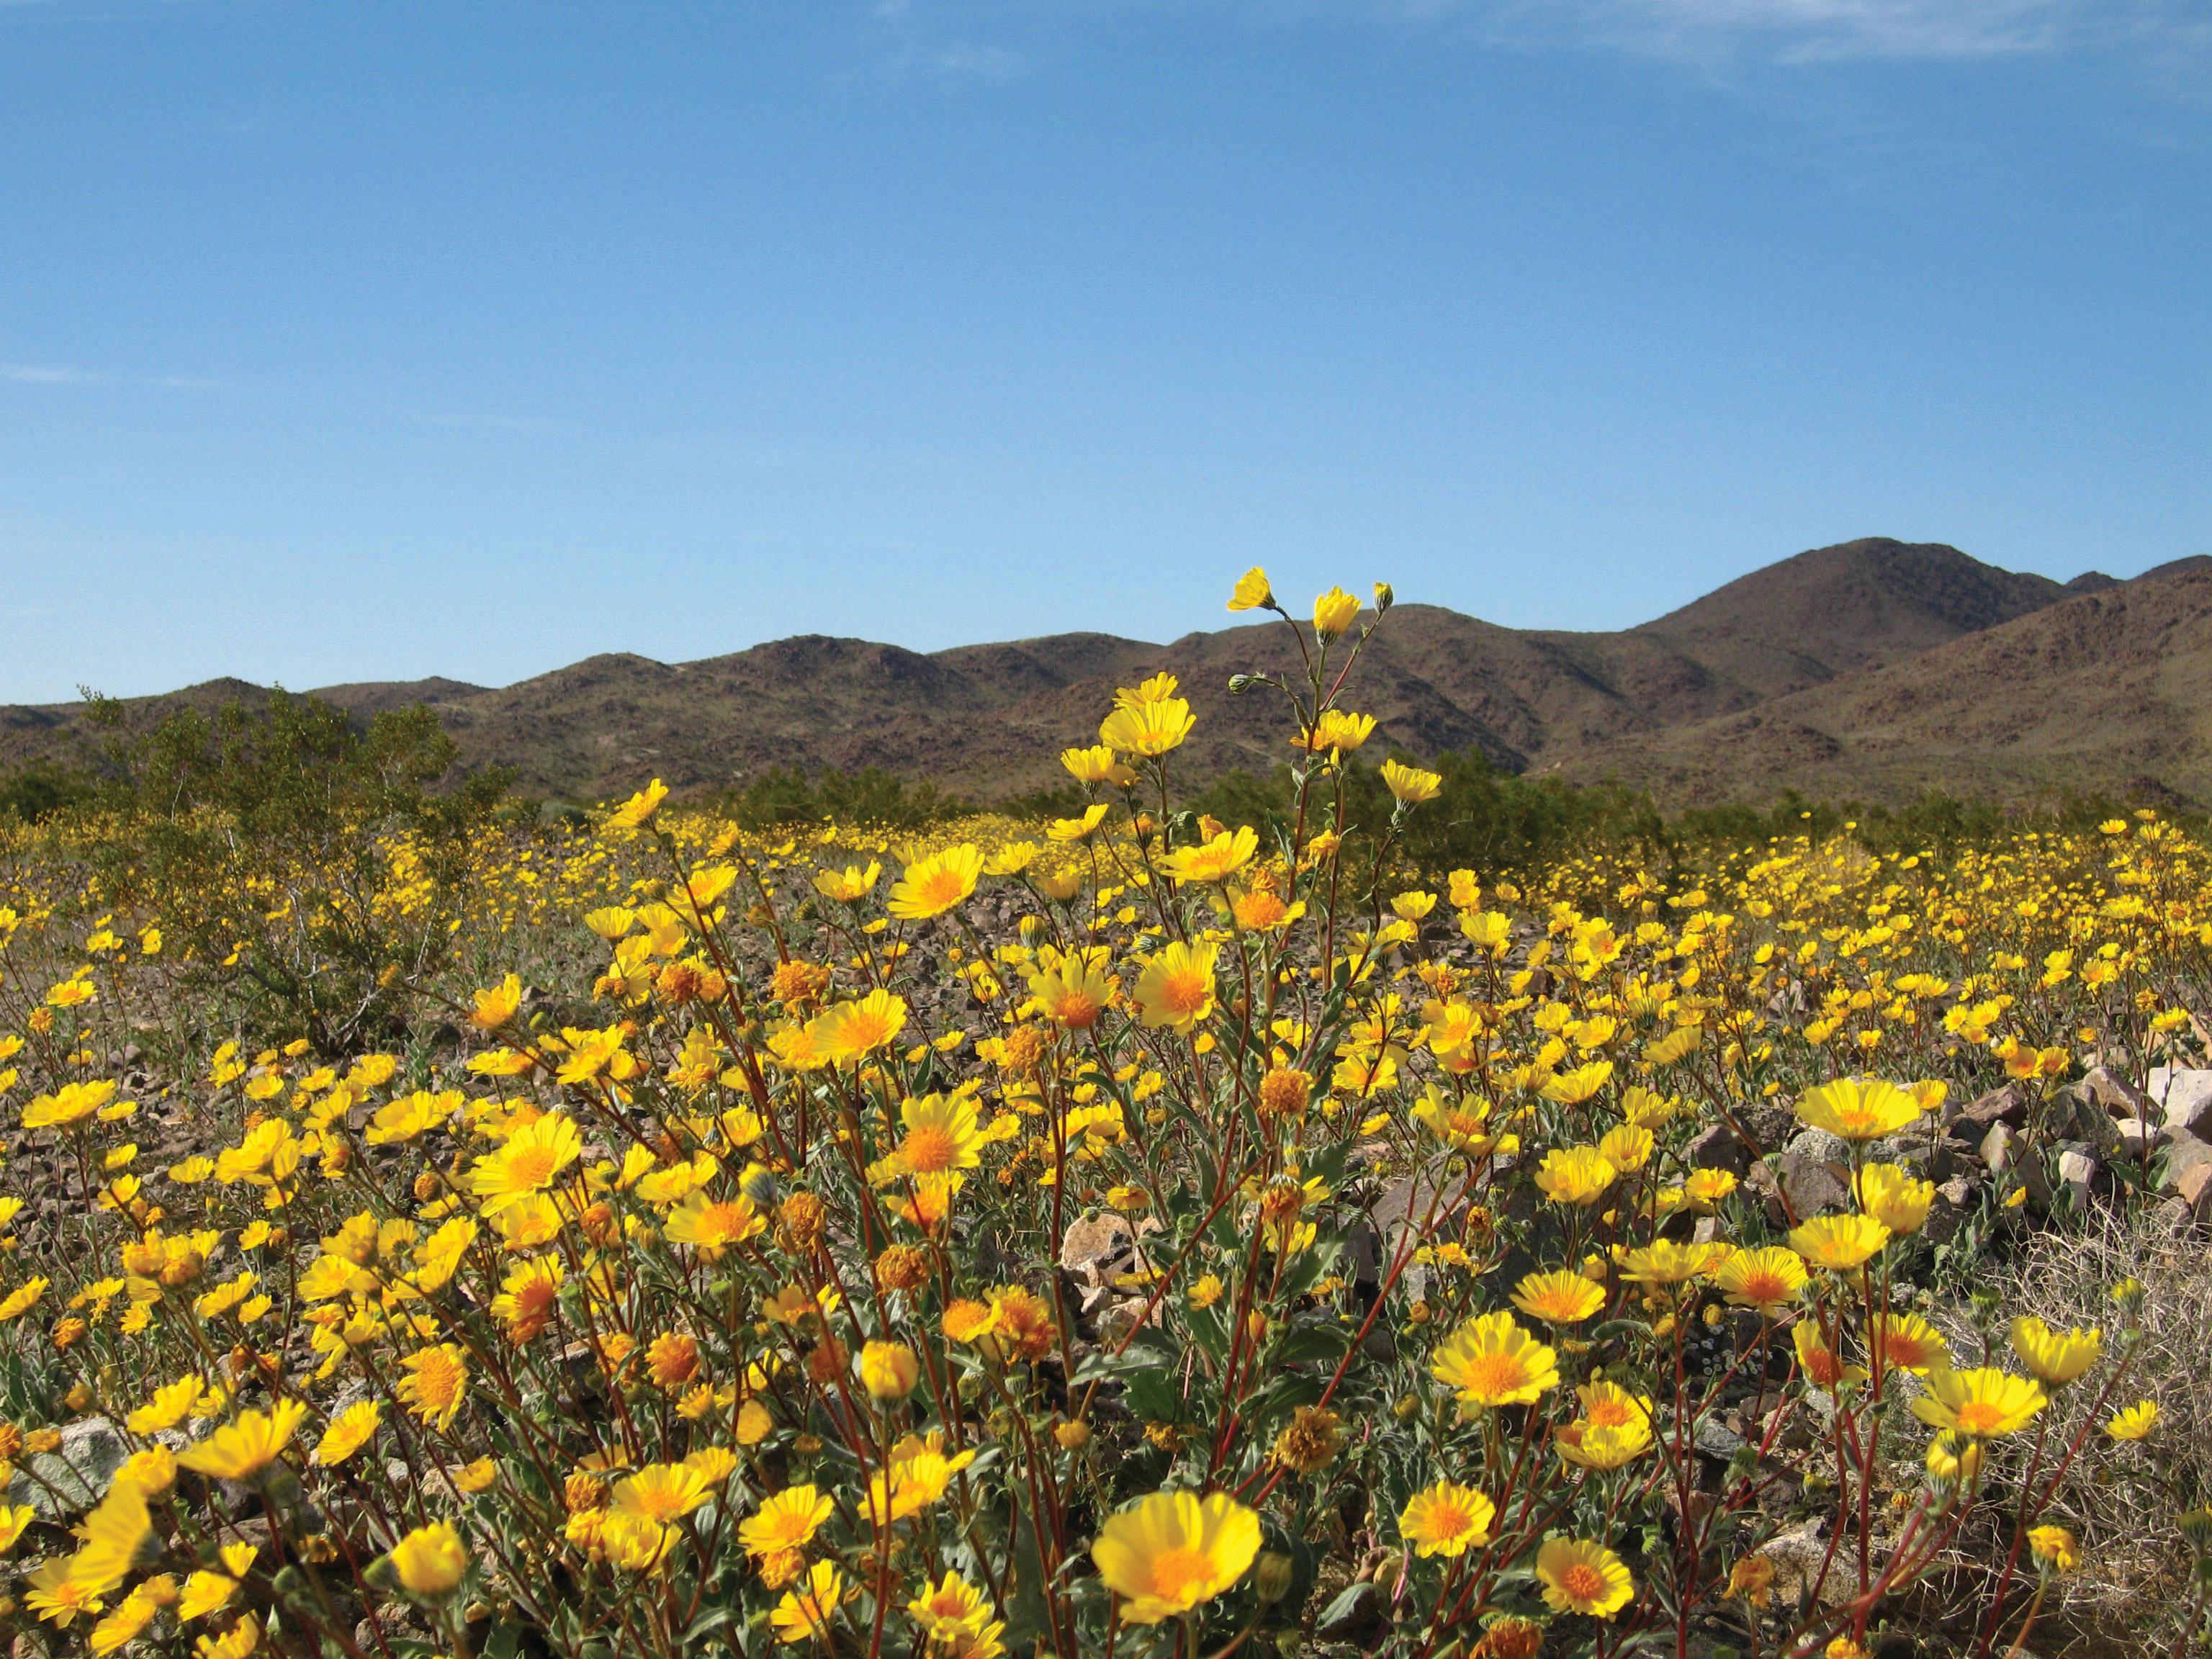 florencia gomez gerbi joshua tree national park hairy desert sunflower